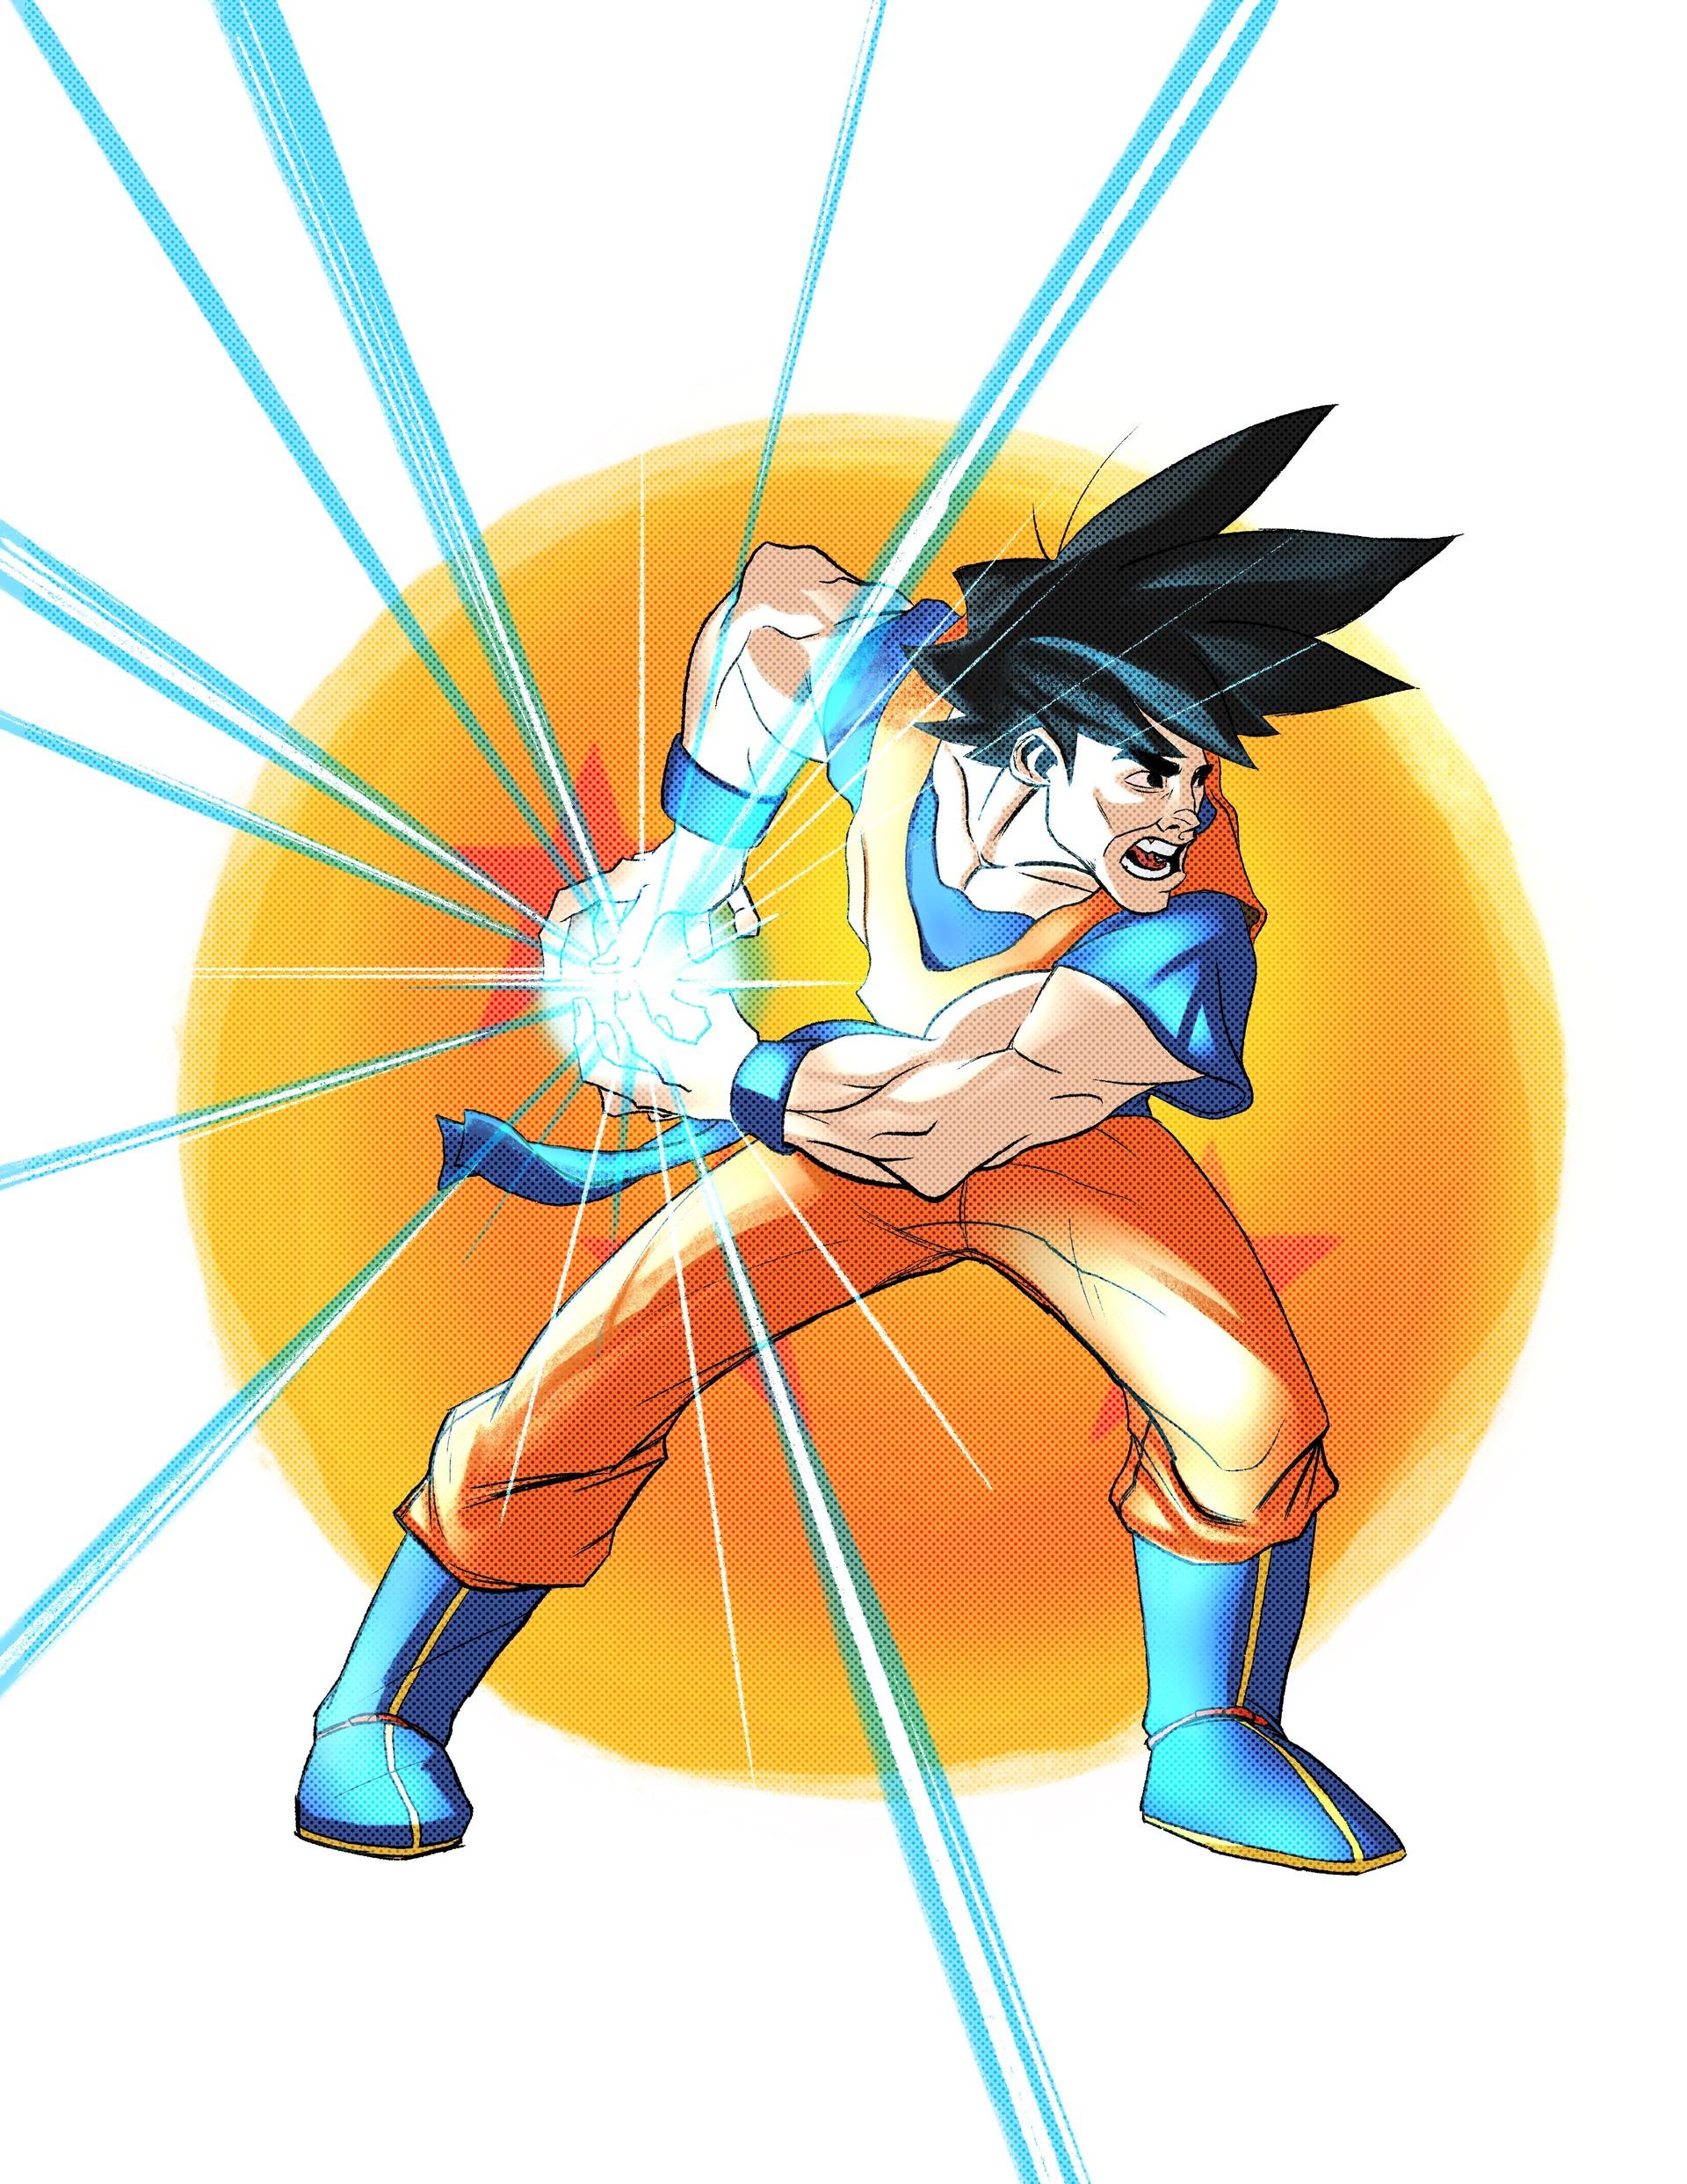 Goku - Digital in Procreate